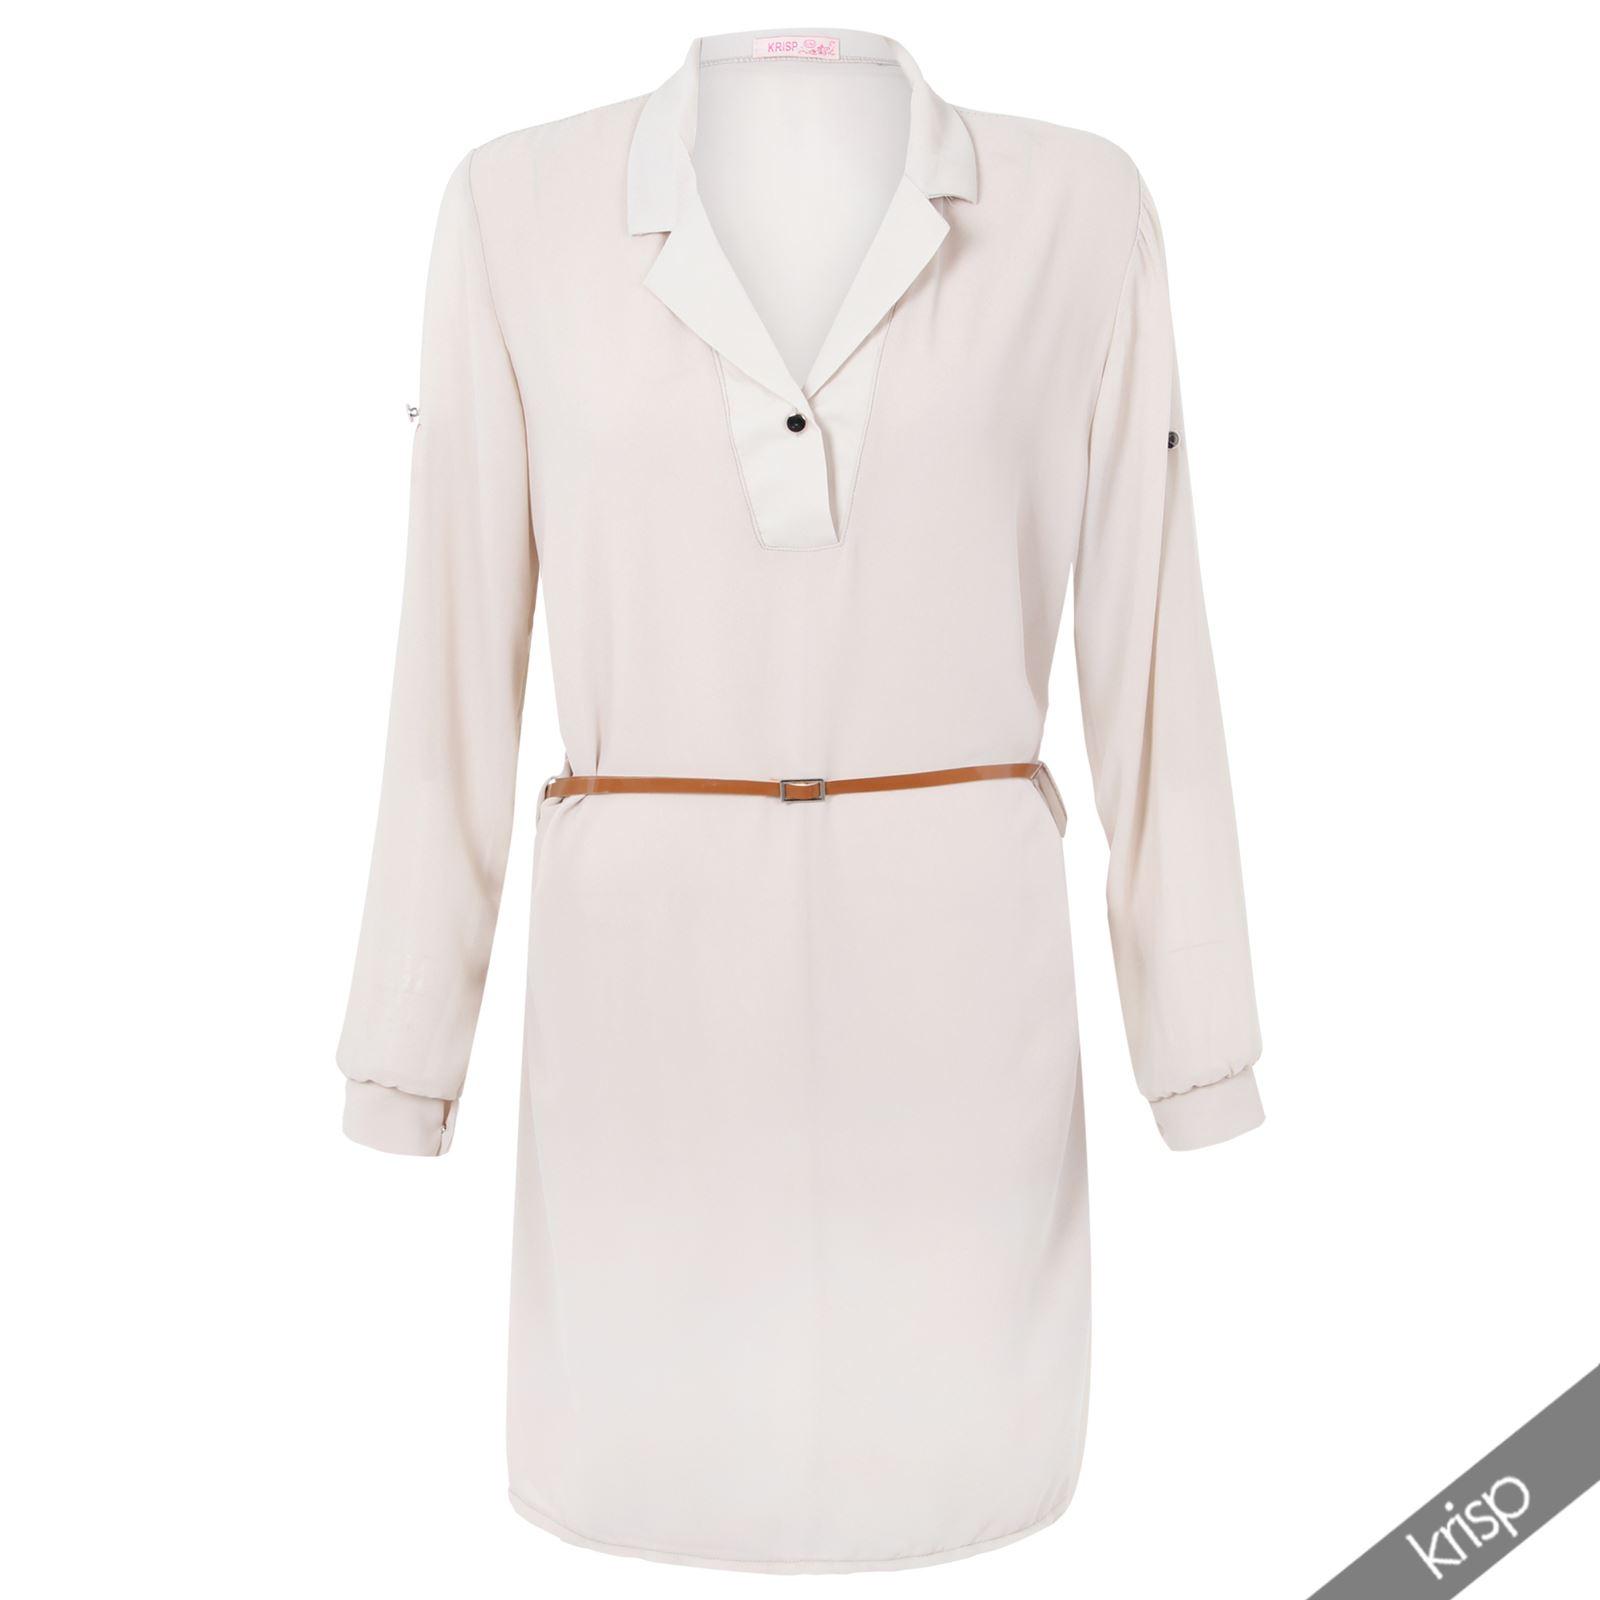 damen oversize chiffon bluse mit g rtel top tunika minikleid longshirt hemd lang ebay. Black Bedroom Furniture Sets. Home Design Ideas